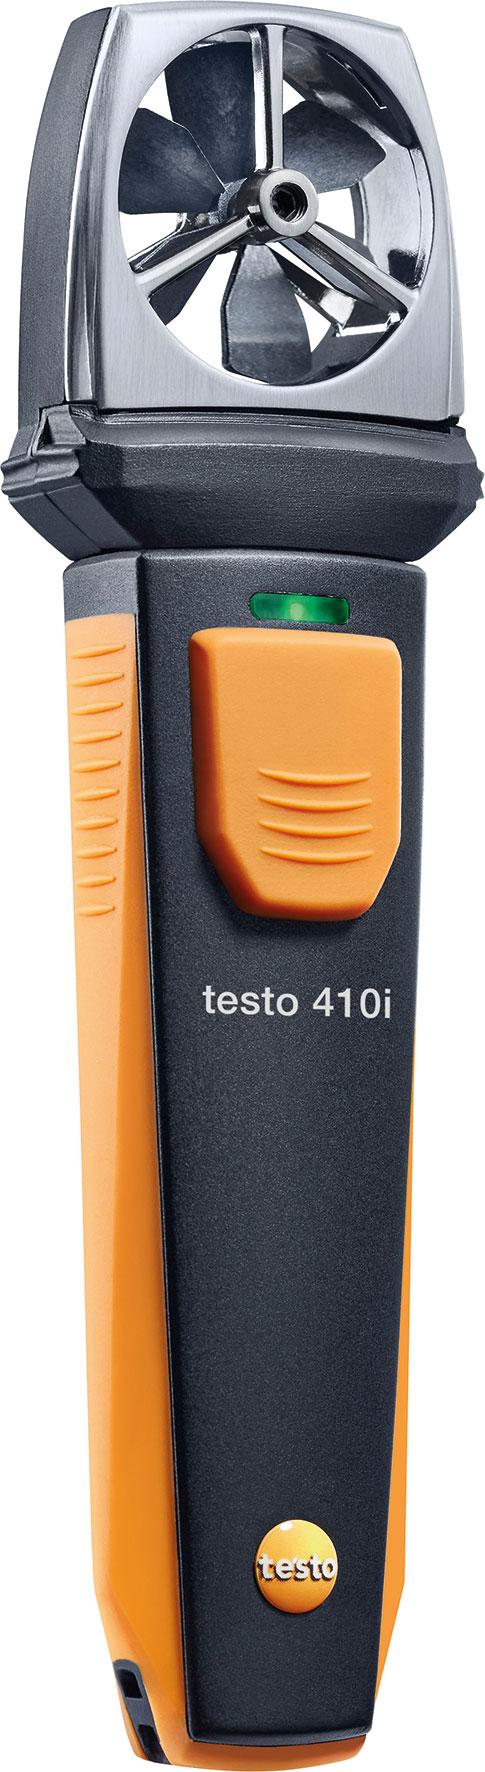 fl gelrad anemometer mit smartphone bedienung testo 410i. Black Bedroom Furniture Sets. Home Design Ideas